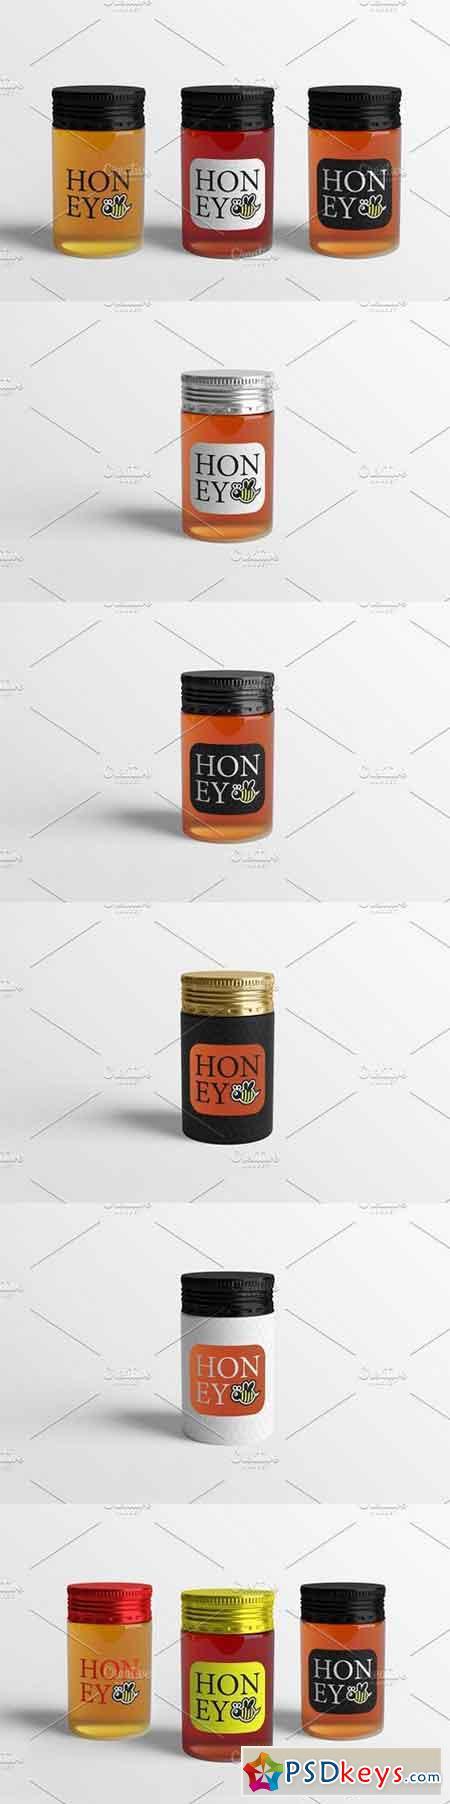 Honey Mock-Up 716770